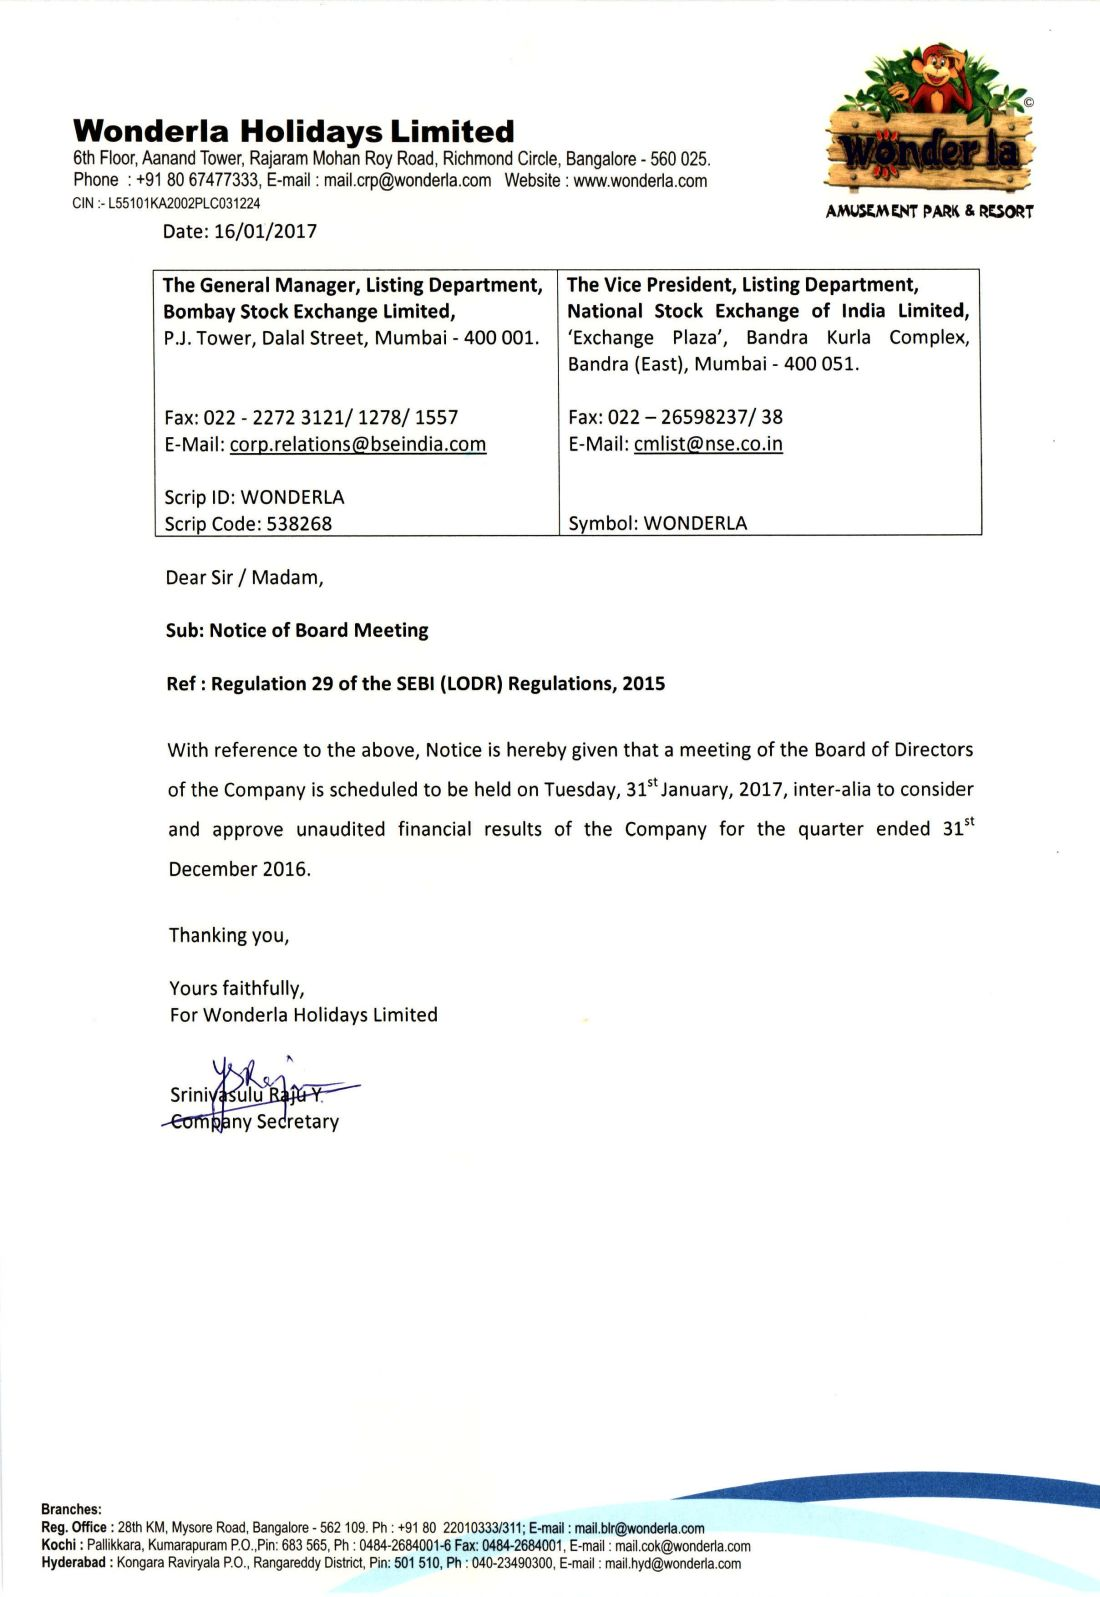 Wonderla Amusement Parks & Resort  Notice of Board Meeting-page-001